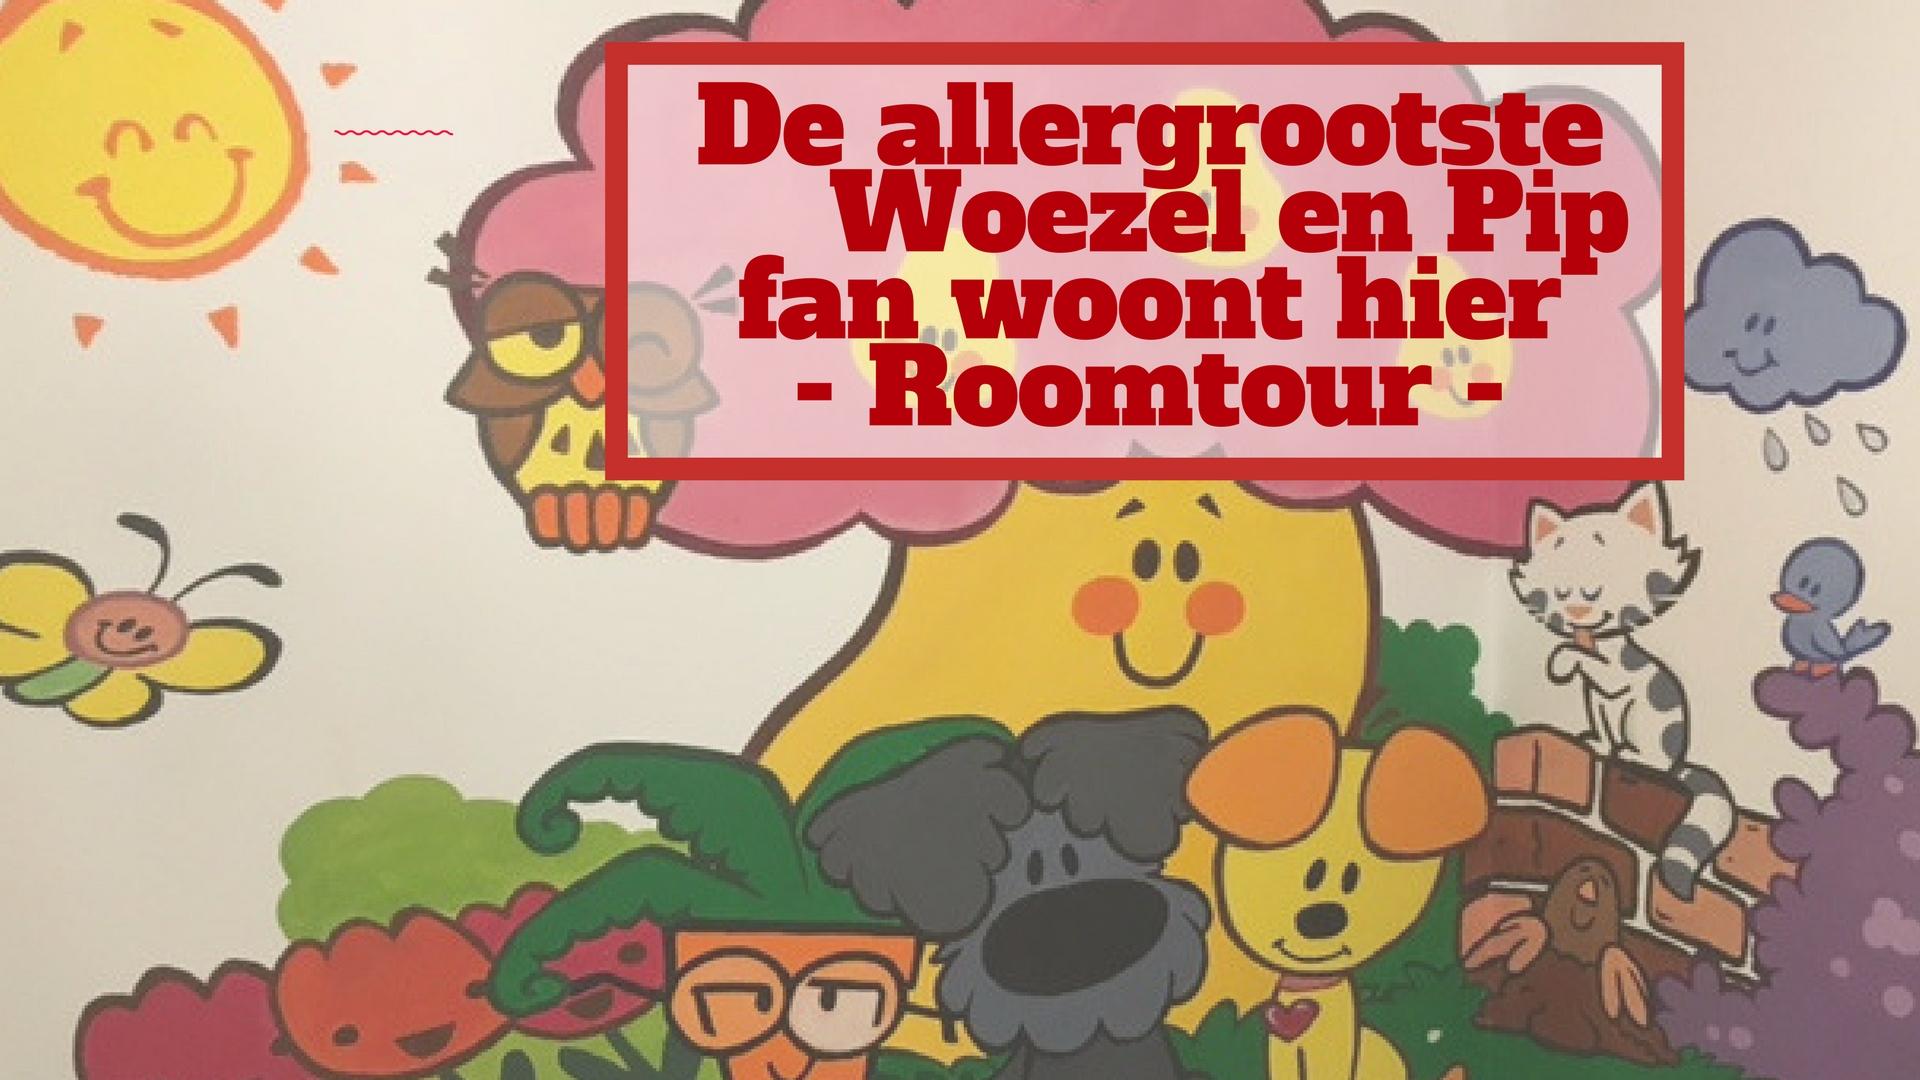 De allergrootste Woezel en Pip fan woont hier - roomtour -